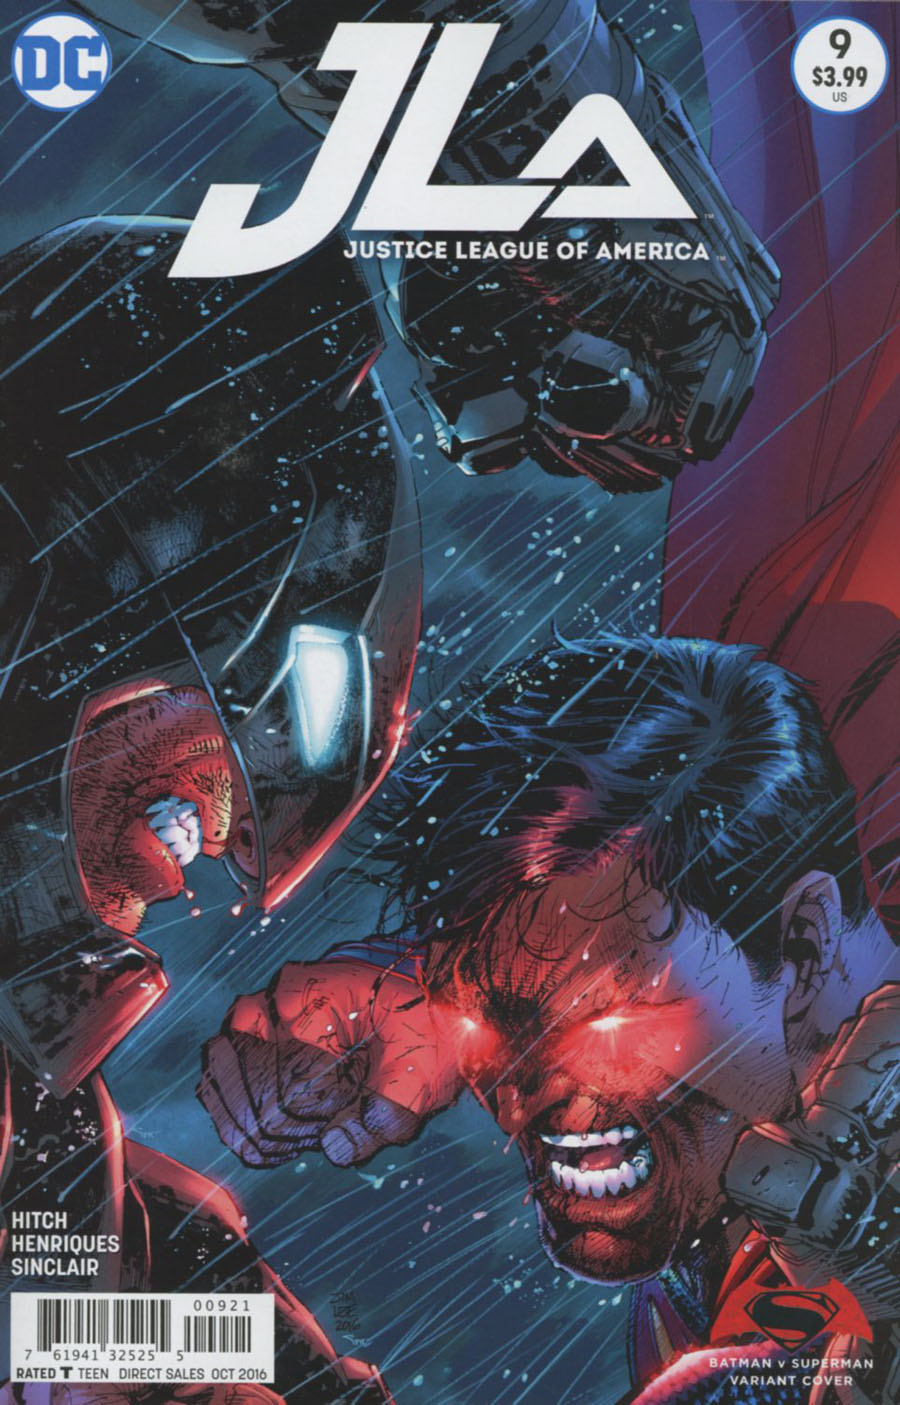 Justice League Of America Vol 4 #9 Cover B Variant Jim Lee Batman v Superman Dawn Of Justice Cover